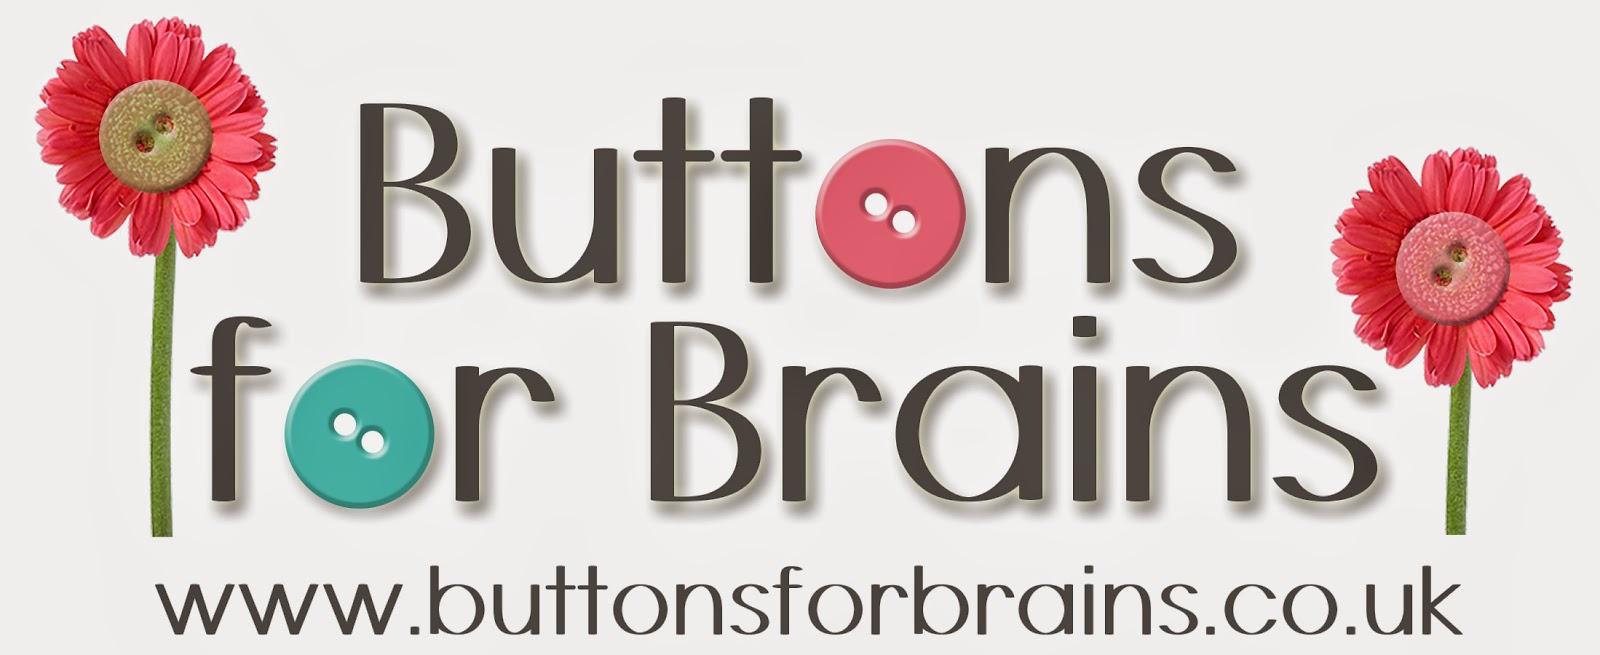 http://www.buttonsforbrains.co.uk/catalog/